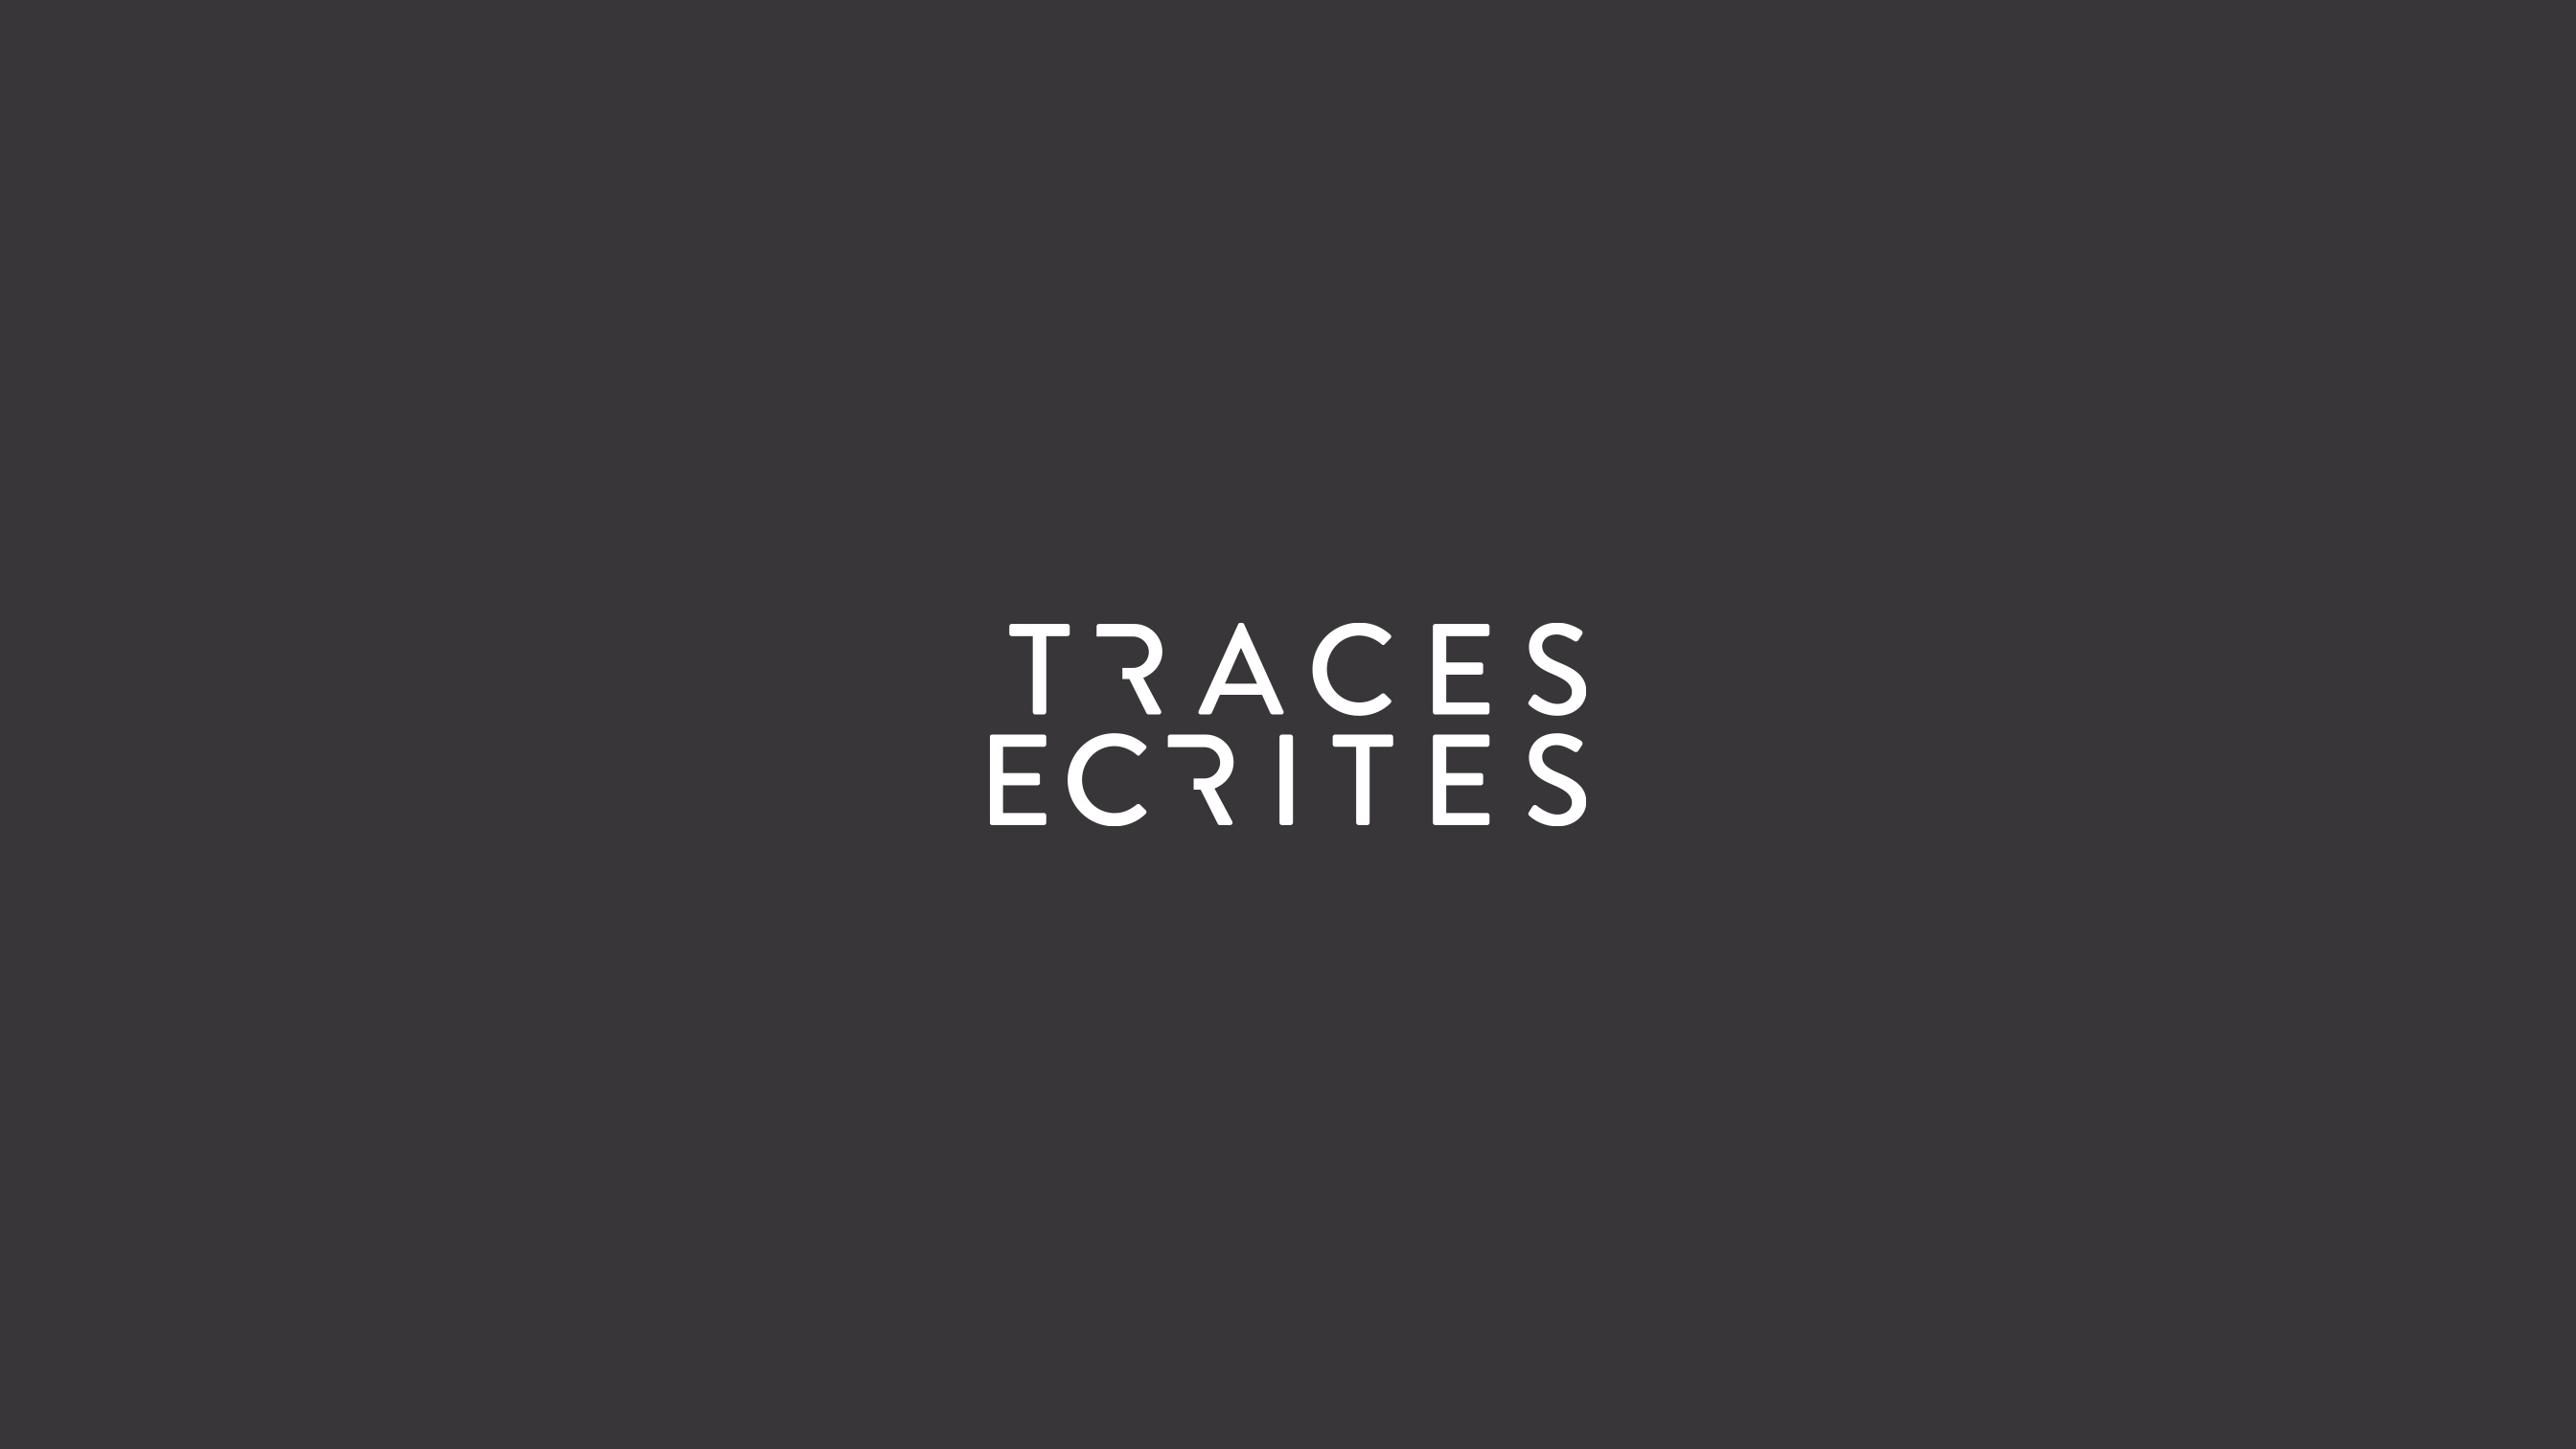 01-traces-ecrites-pikteo-webdesign-graphic-design-freelance-paris-bruxelles-londres